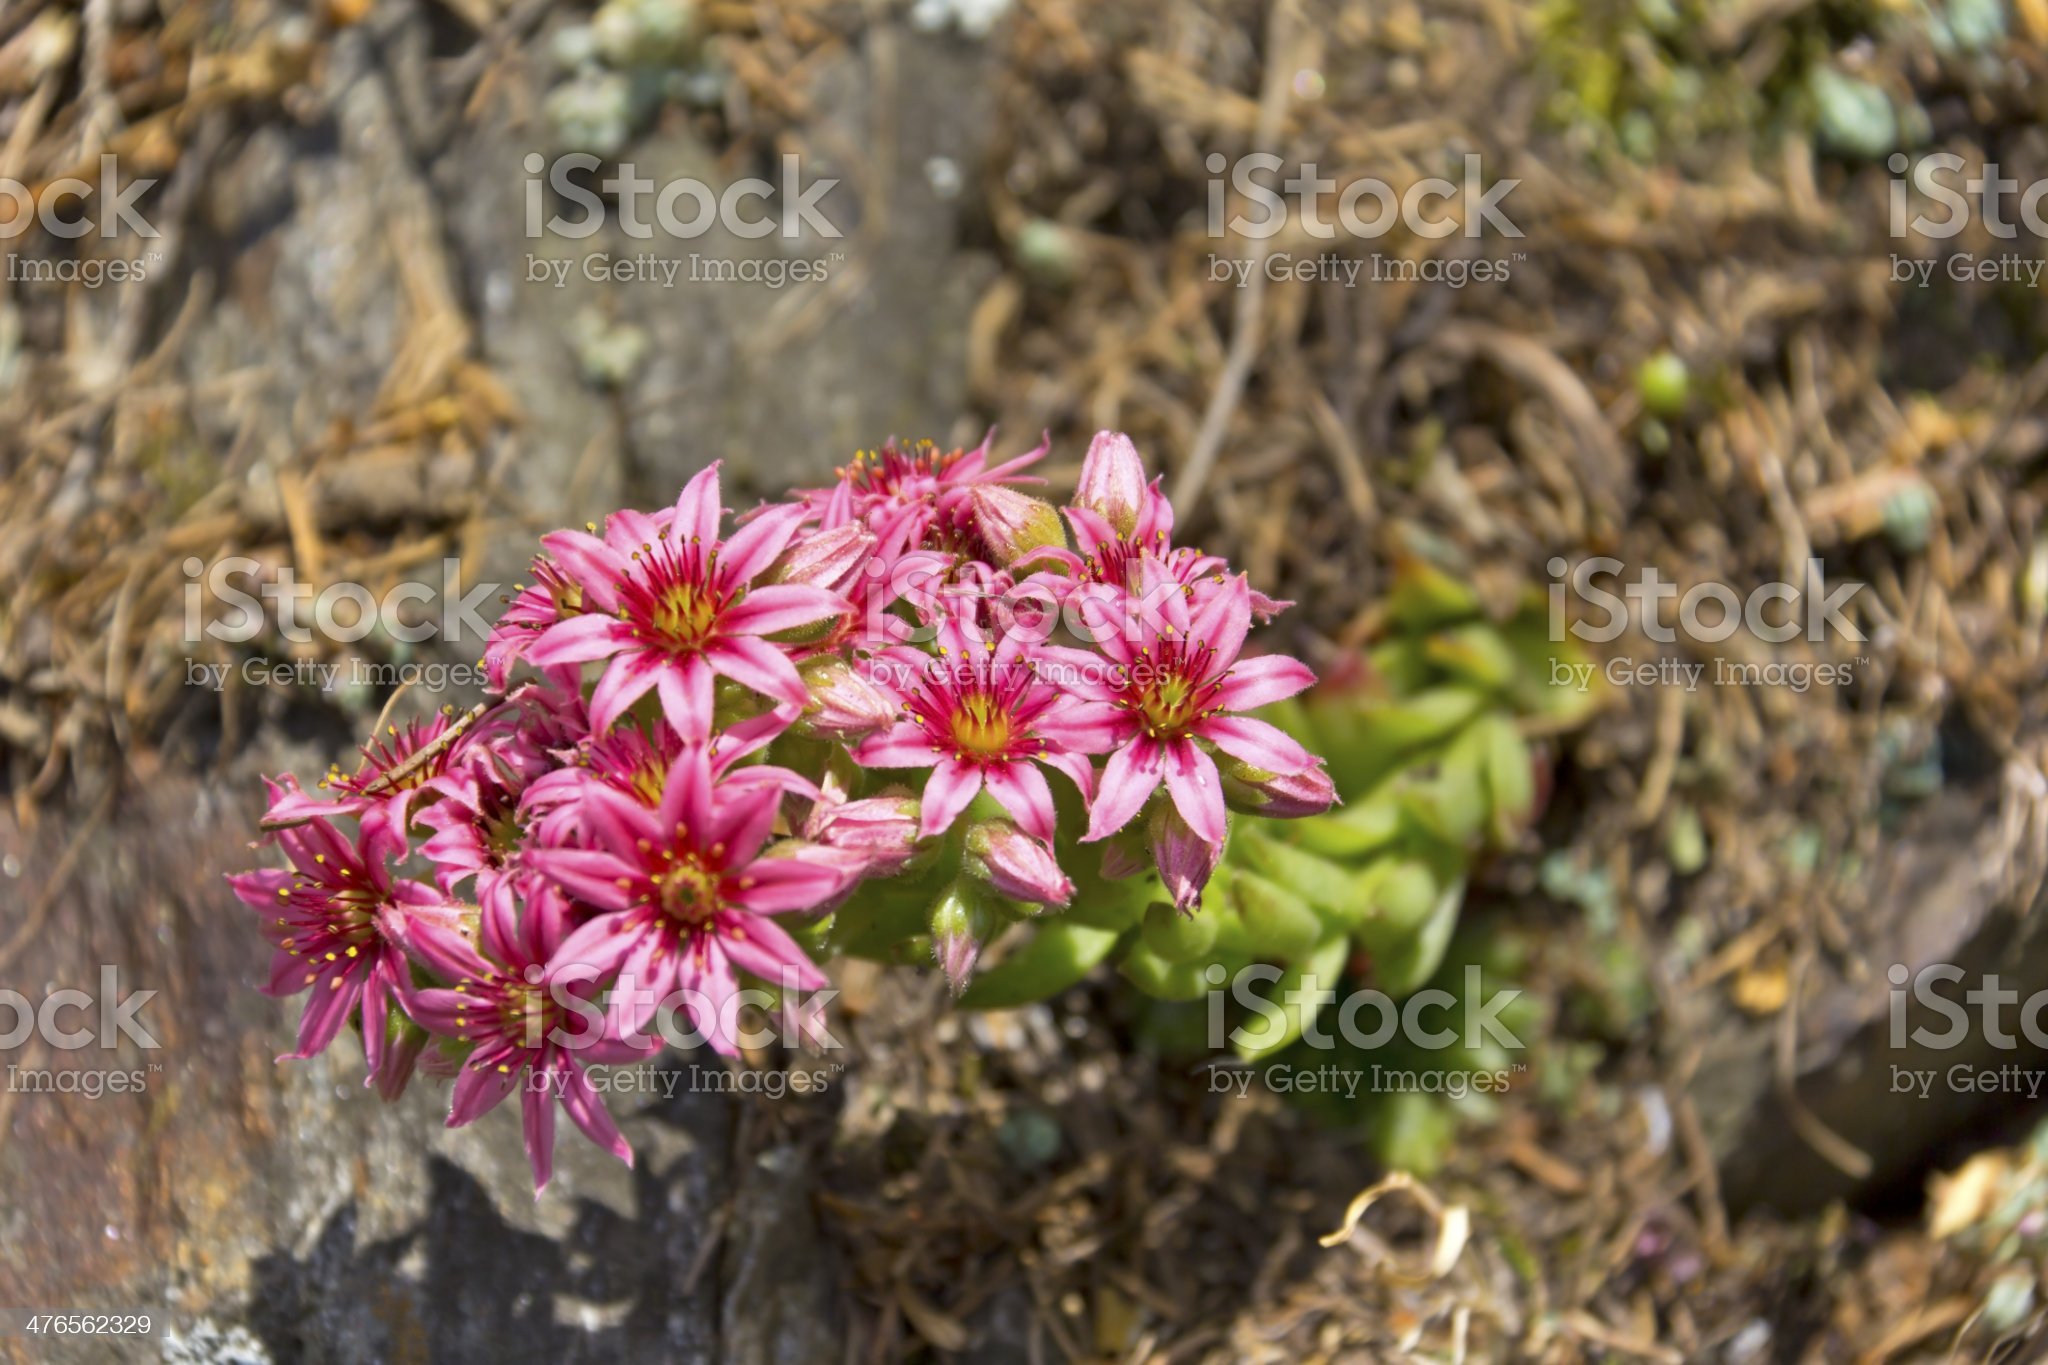 Sempervivum montanum, Crassulaceae, Stonecrop Family from the Eu royalty-free stock photo